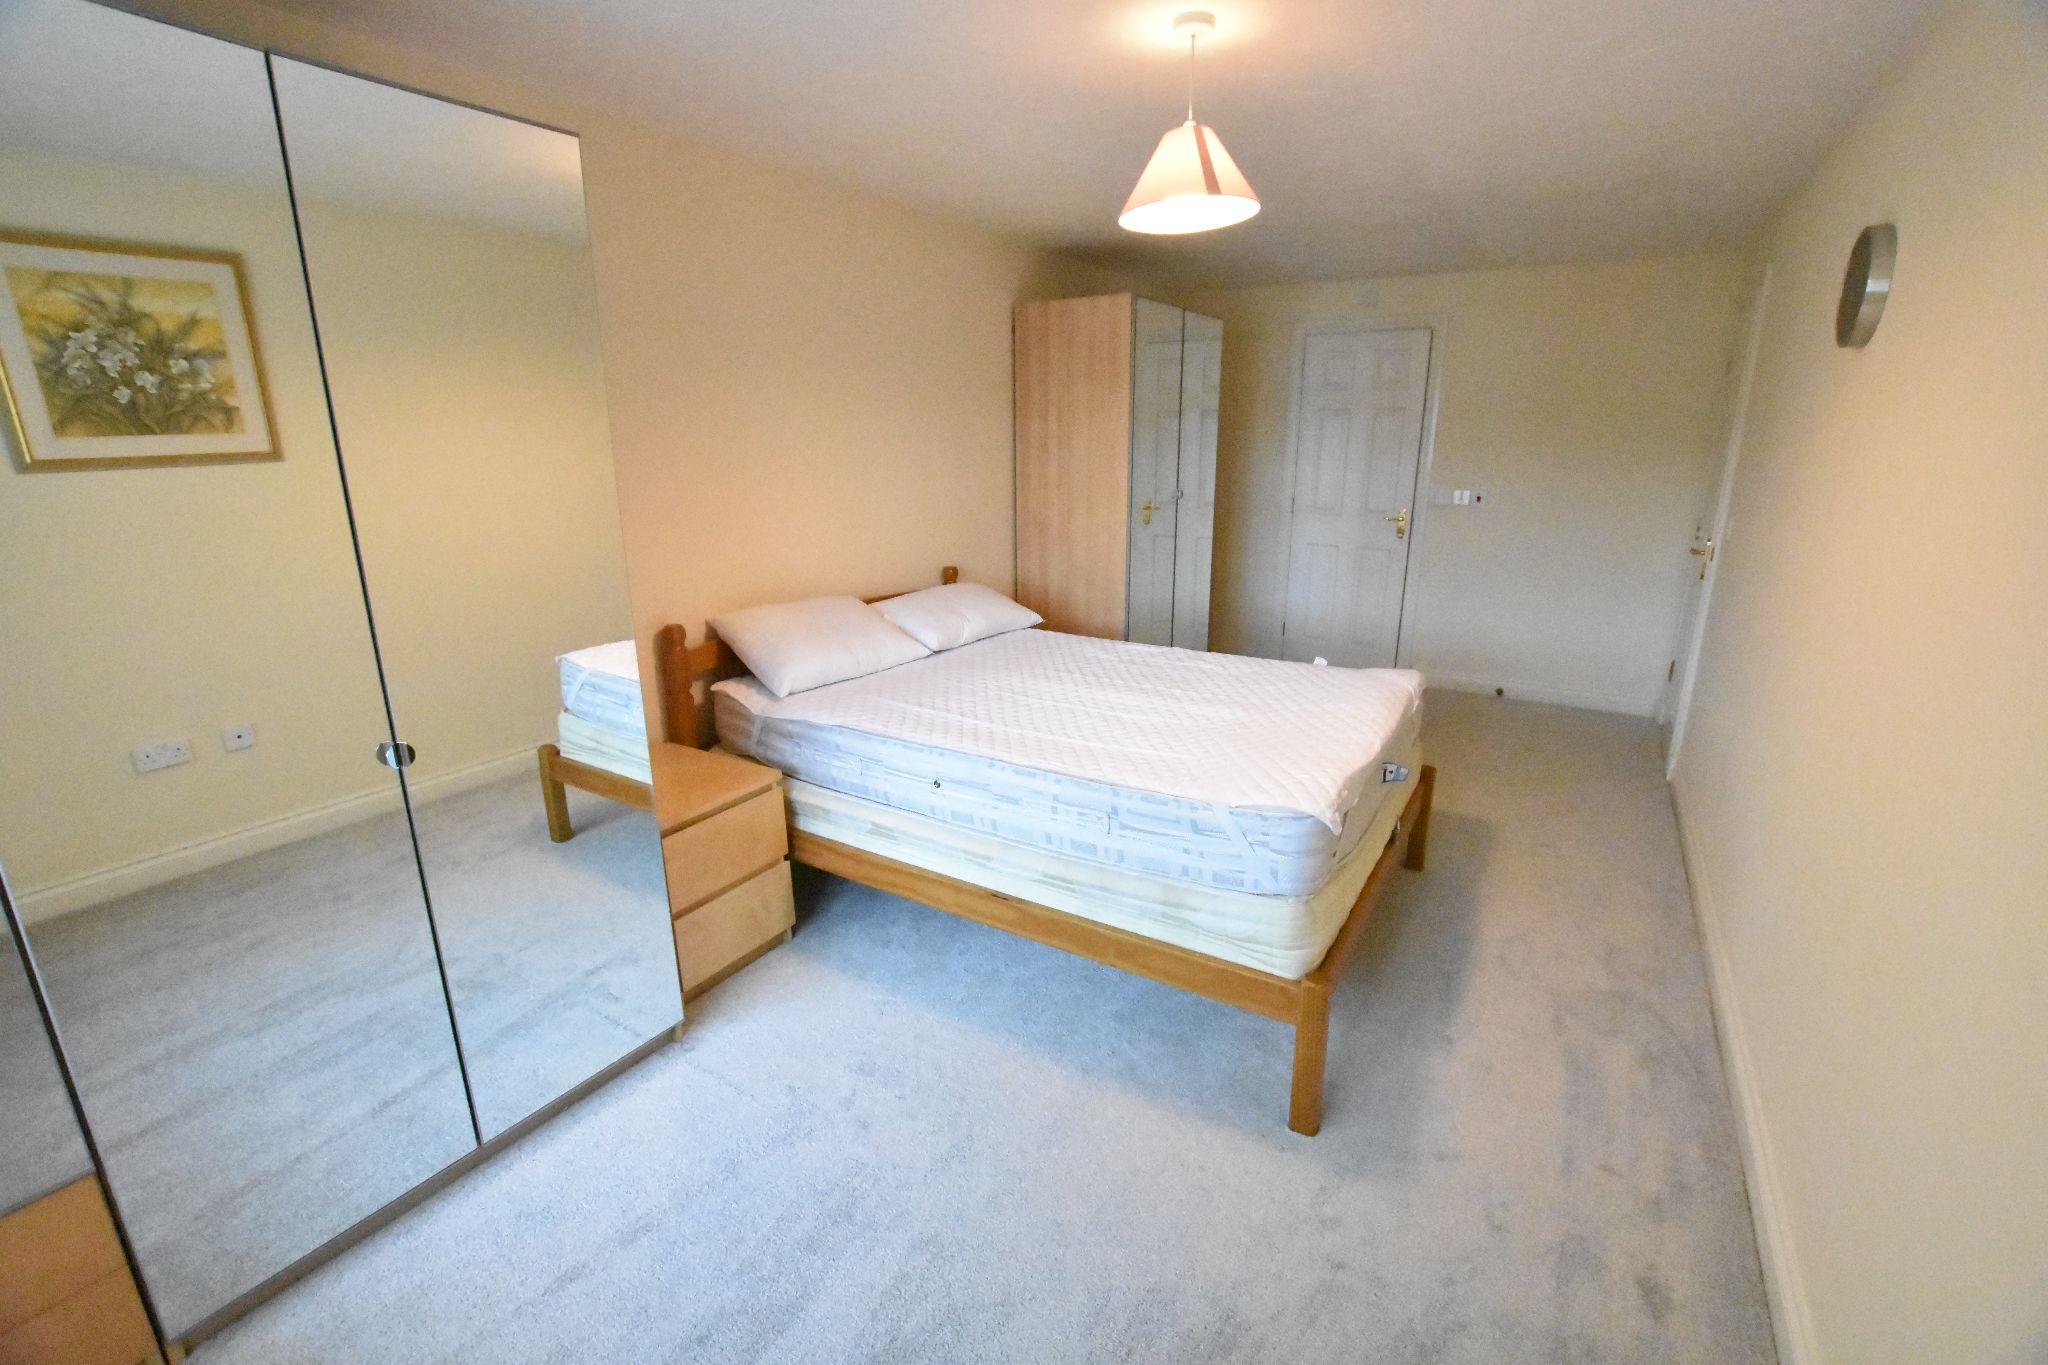 2 bedroom apartment flat/apartment Sold STC in Preston - Bedroom 1